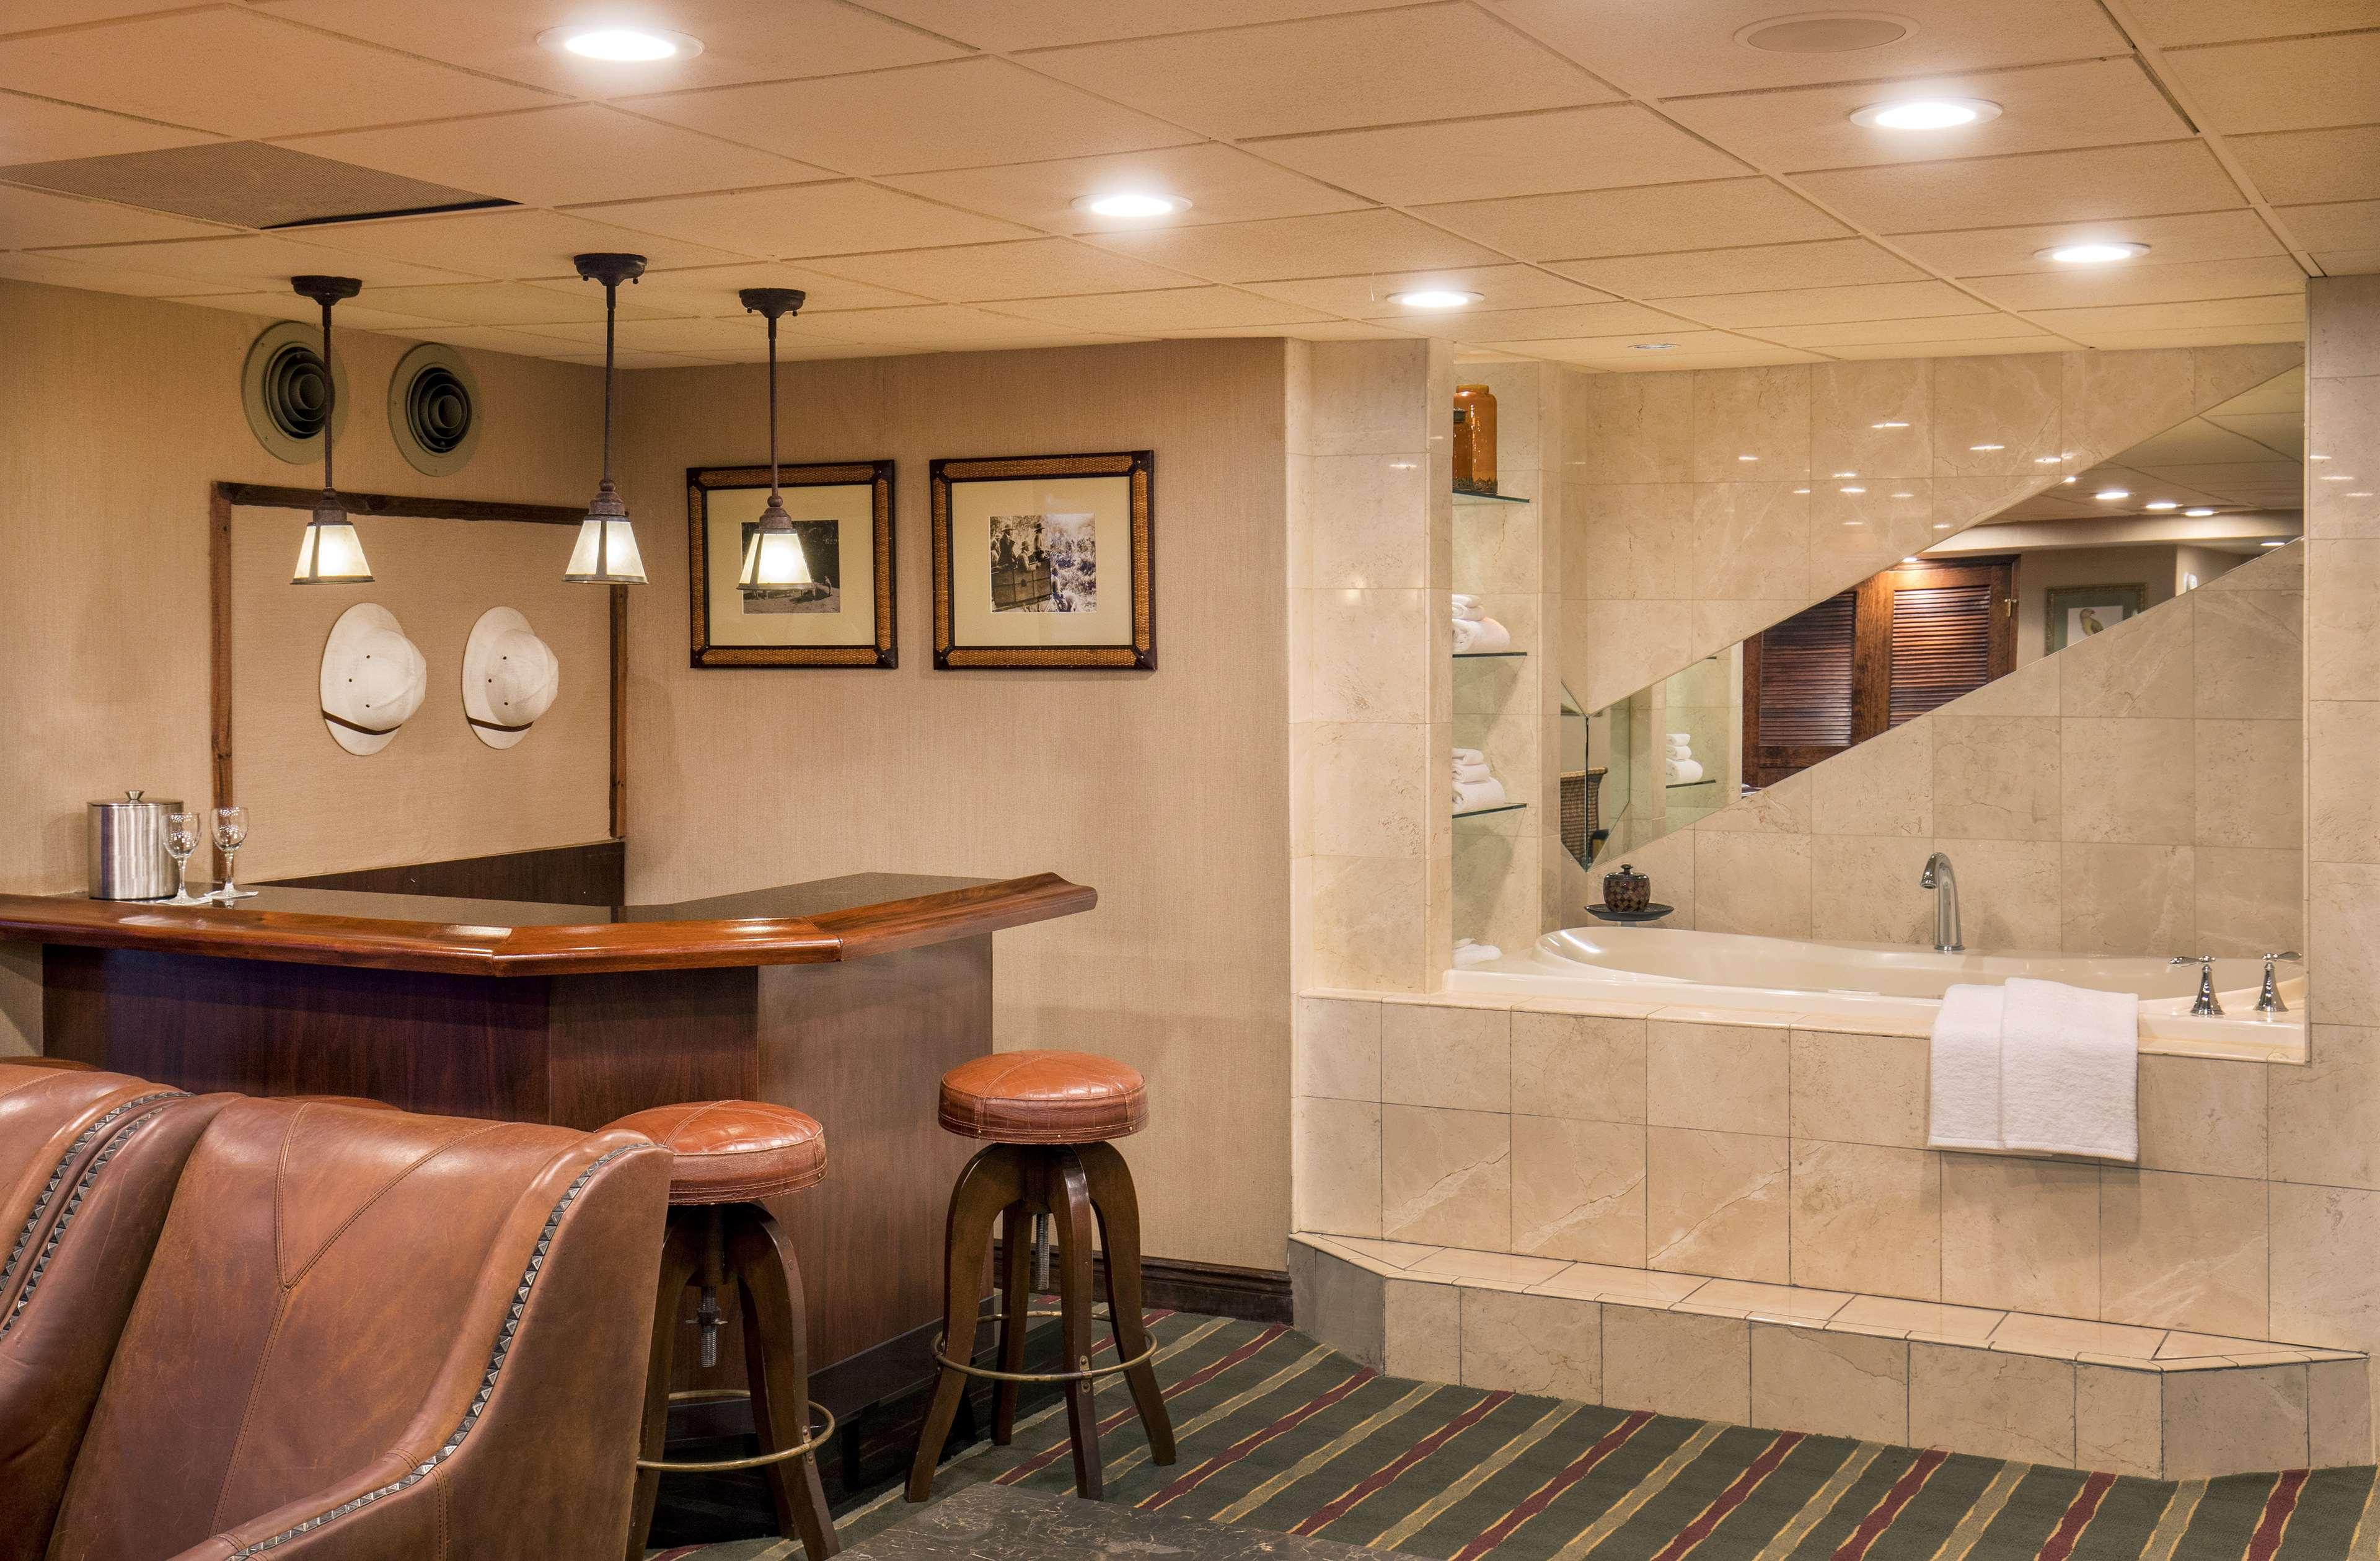 Pier 5 Hotel Baltimore, Curio Collection by Hilton image 10